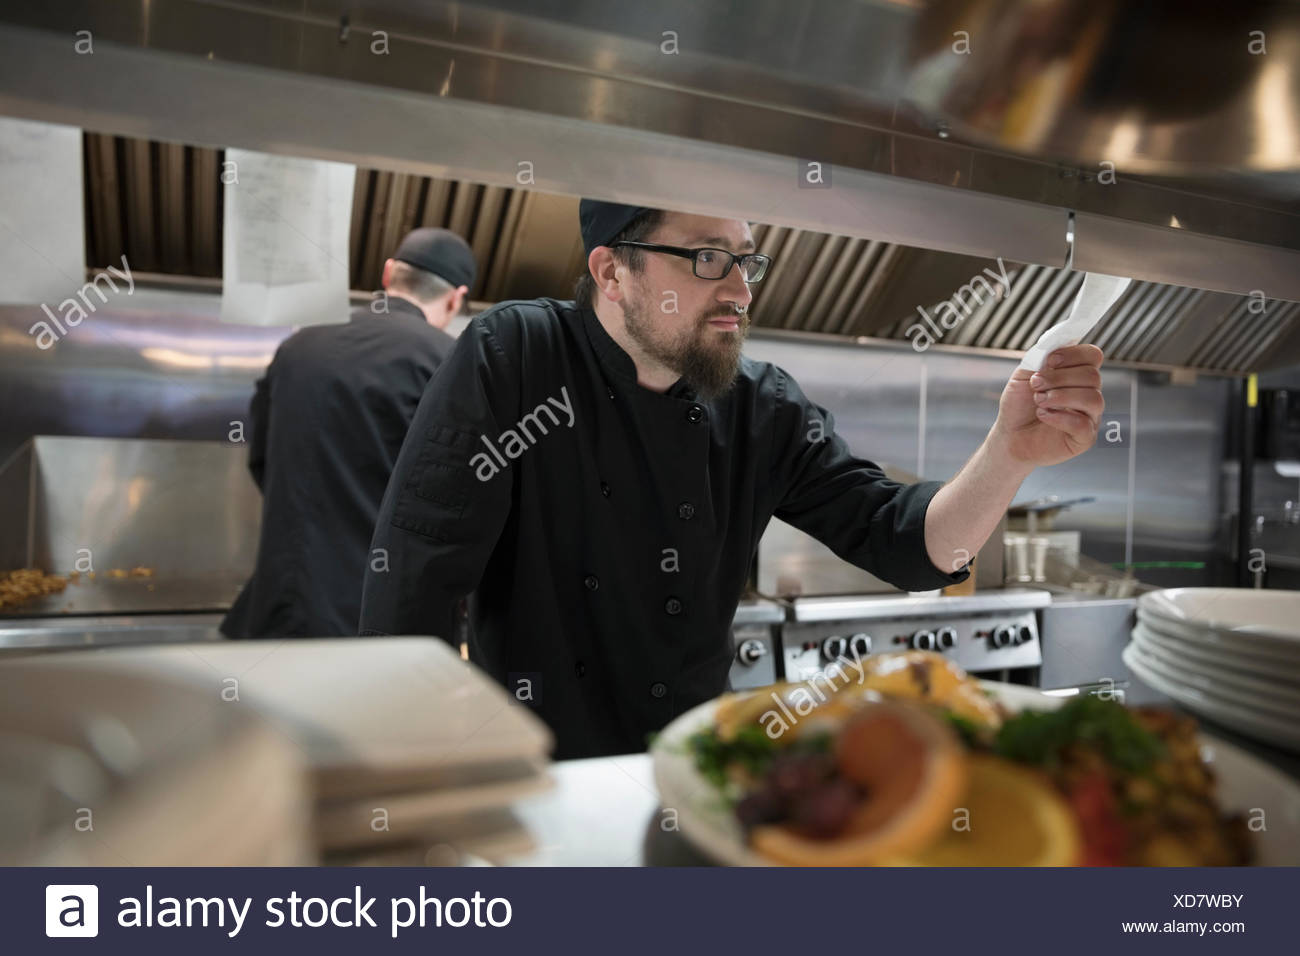 Line cook checking order, preparing food in restaurant kitchen - Stock Image